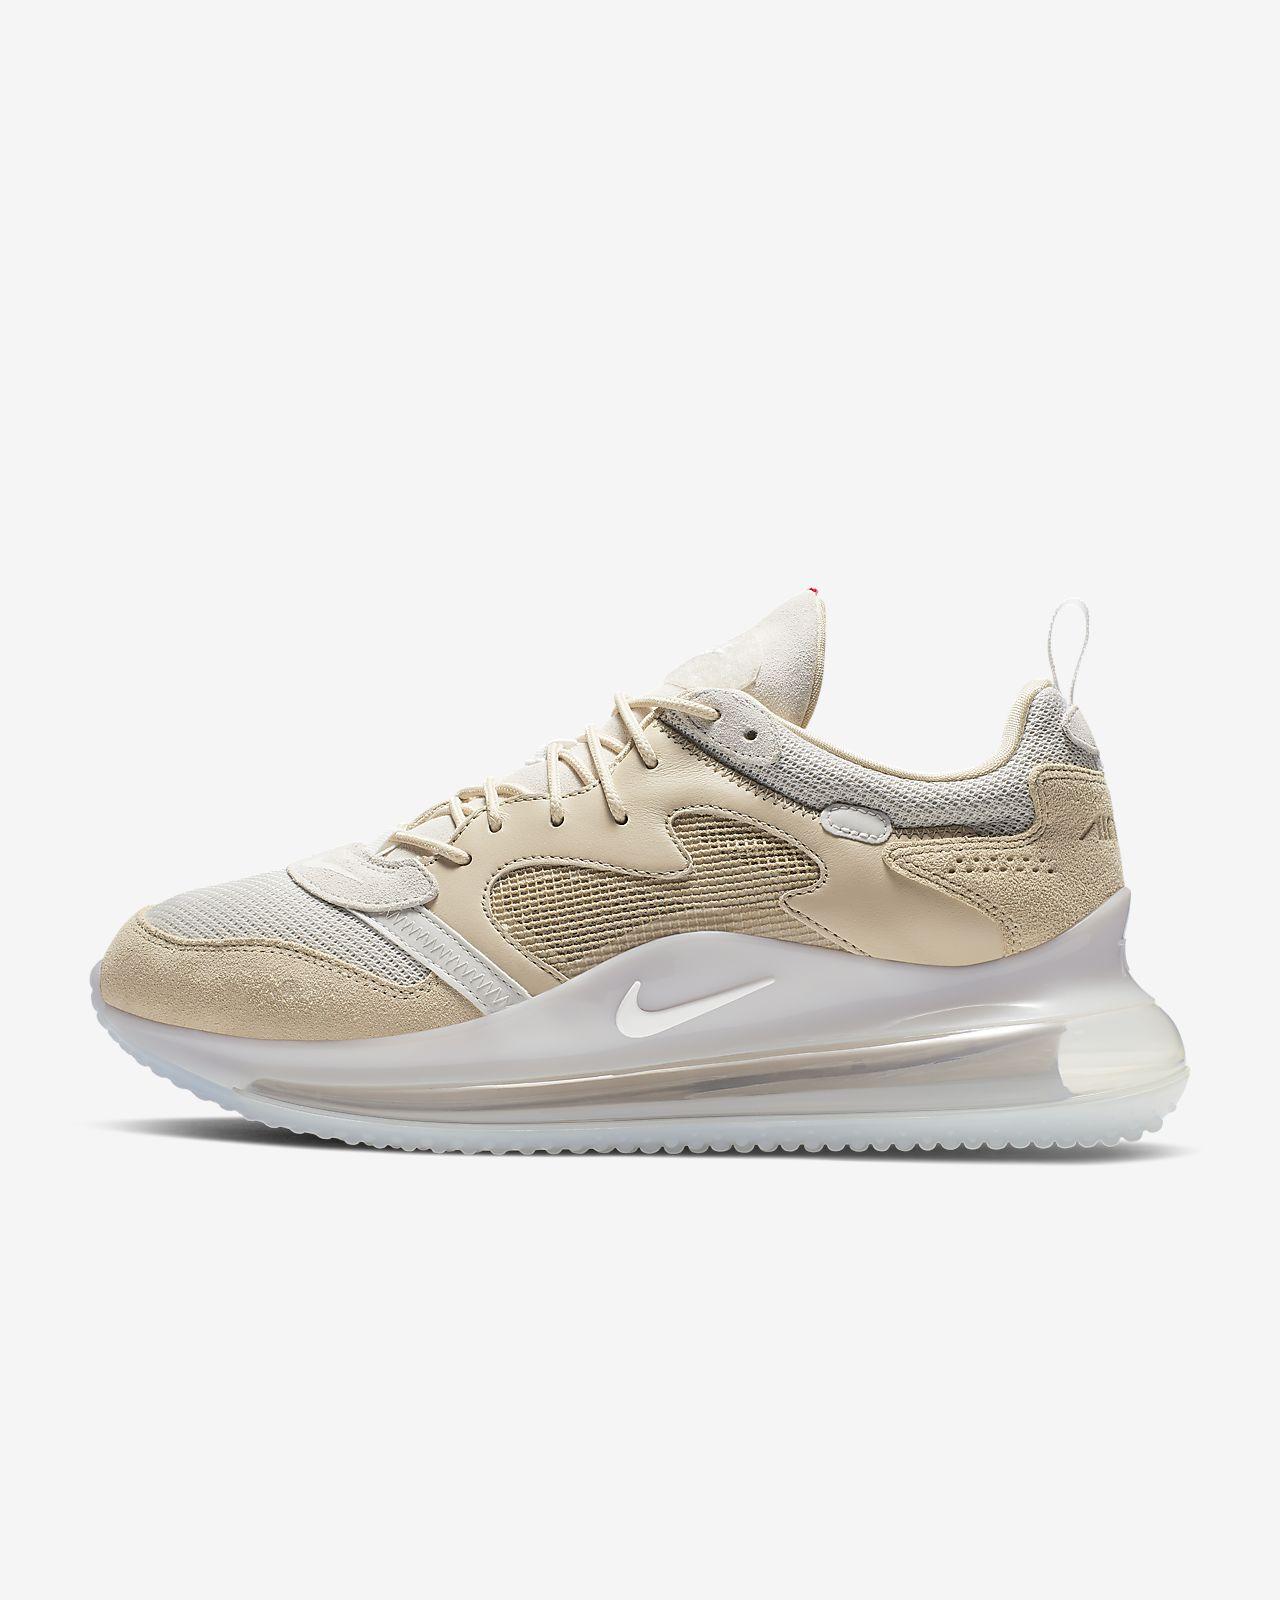 Nike Air Max 720 (OBJ) Men's Shoe. Nike NZ